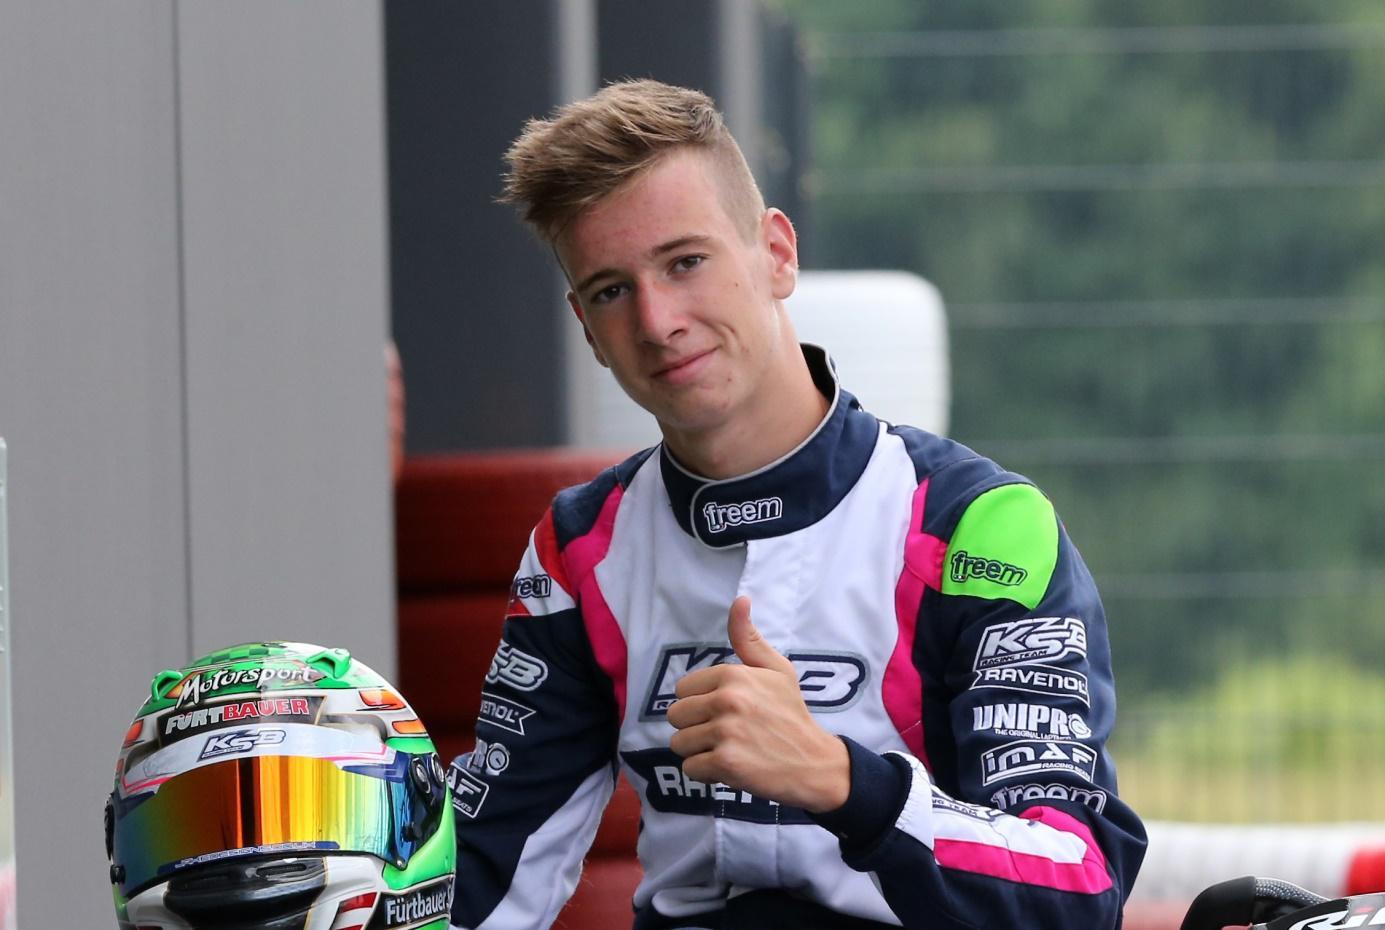 From karts to F4, Stefan Fürtbauer is enjoying his debut season